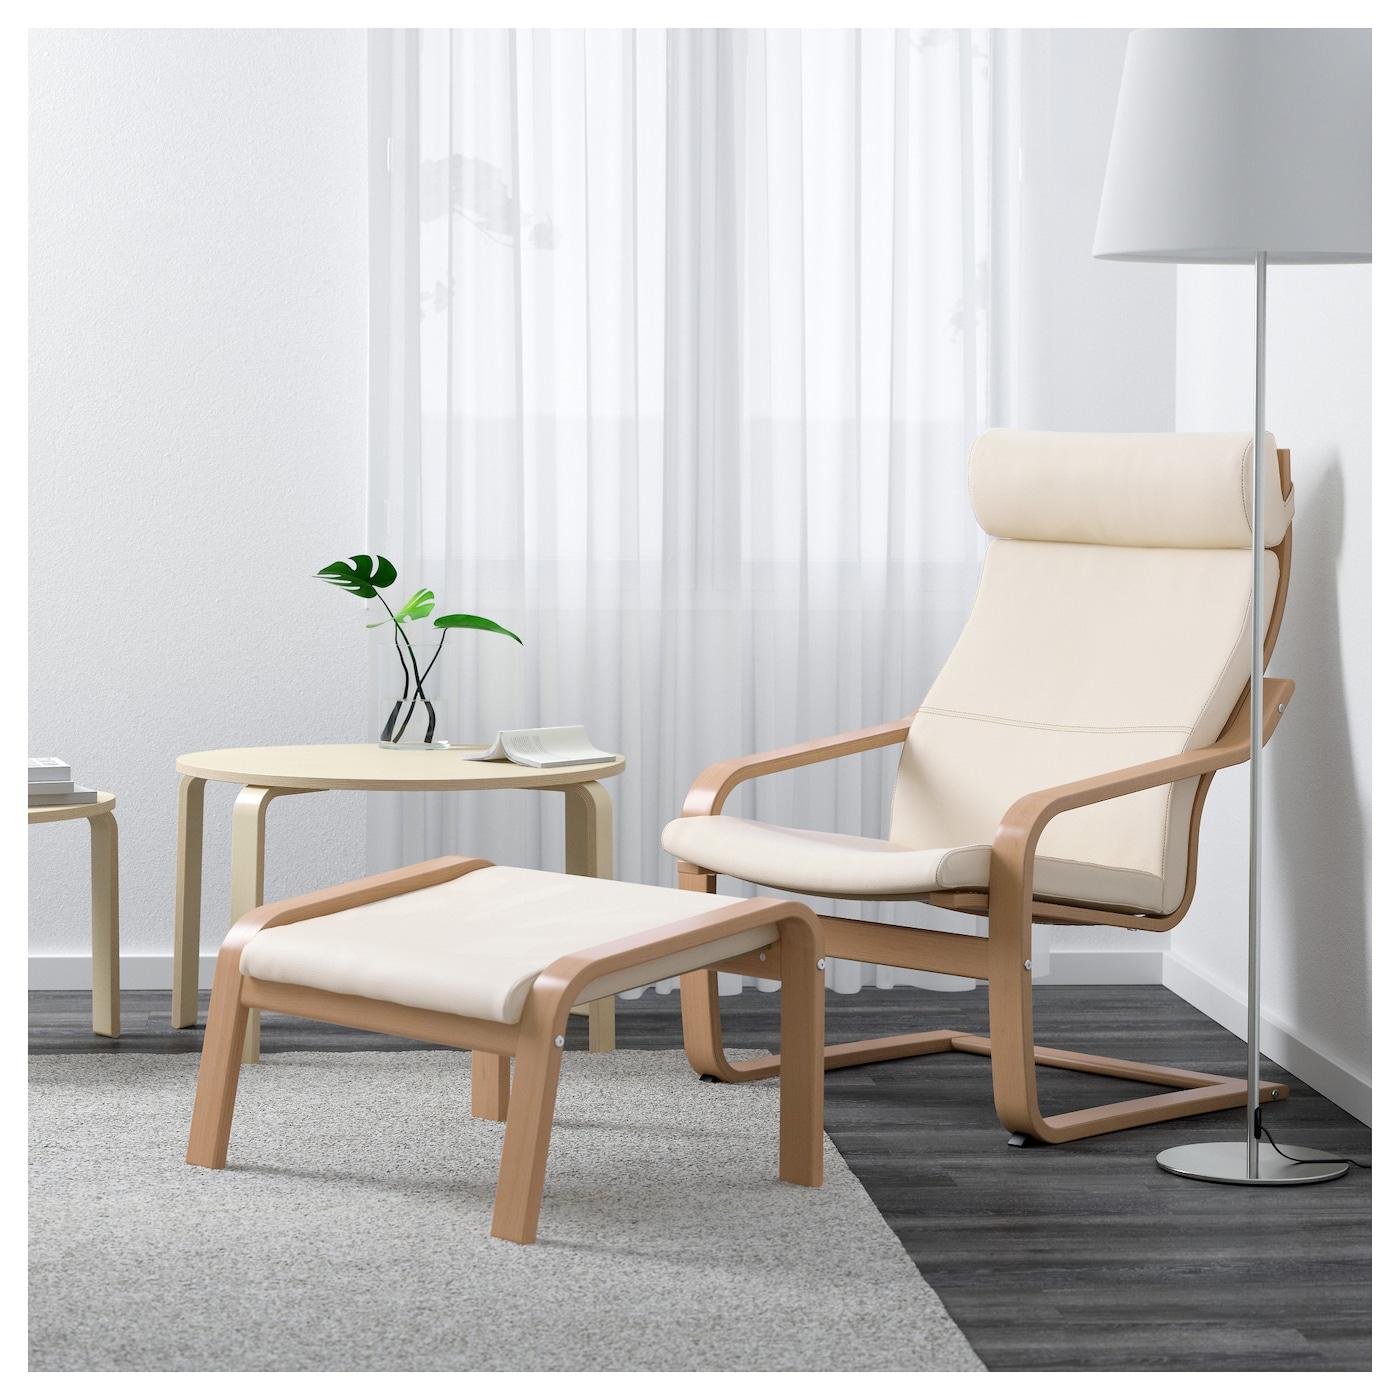 po ng fauteuil beukenfineer glose ecru ikea. Black Bedroom Furniture Sets. Home Design Ideas